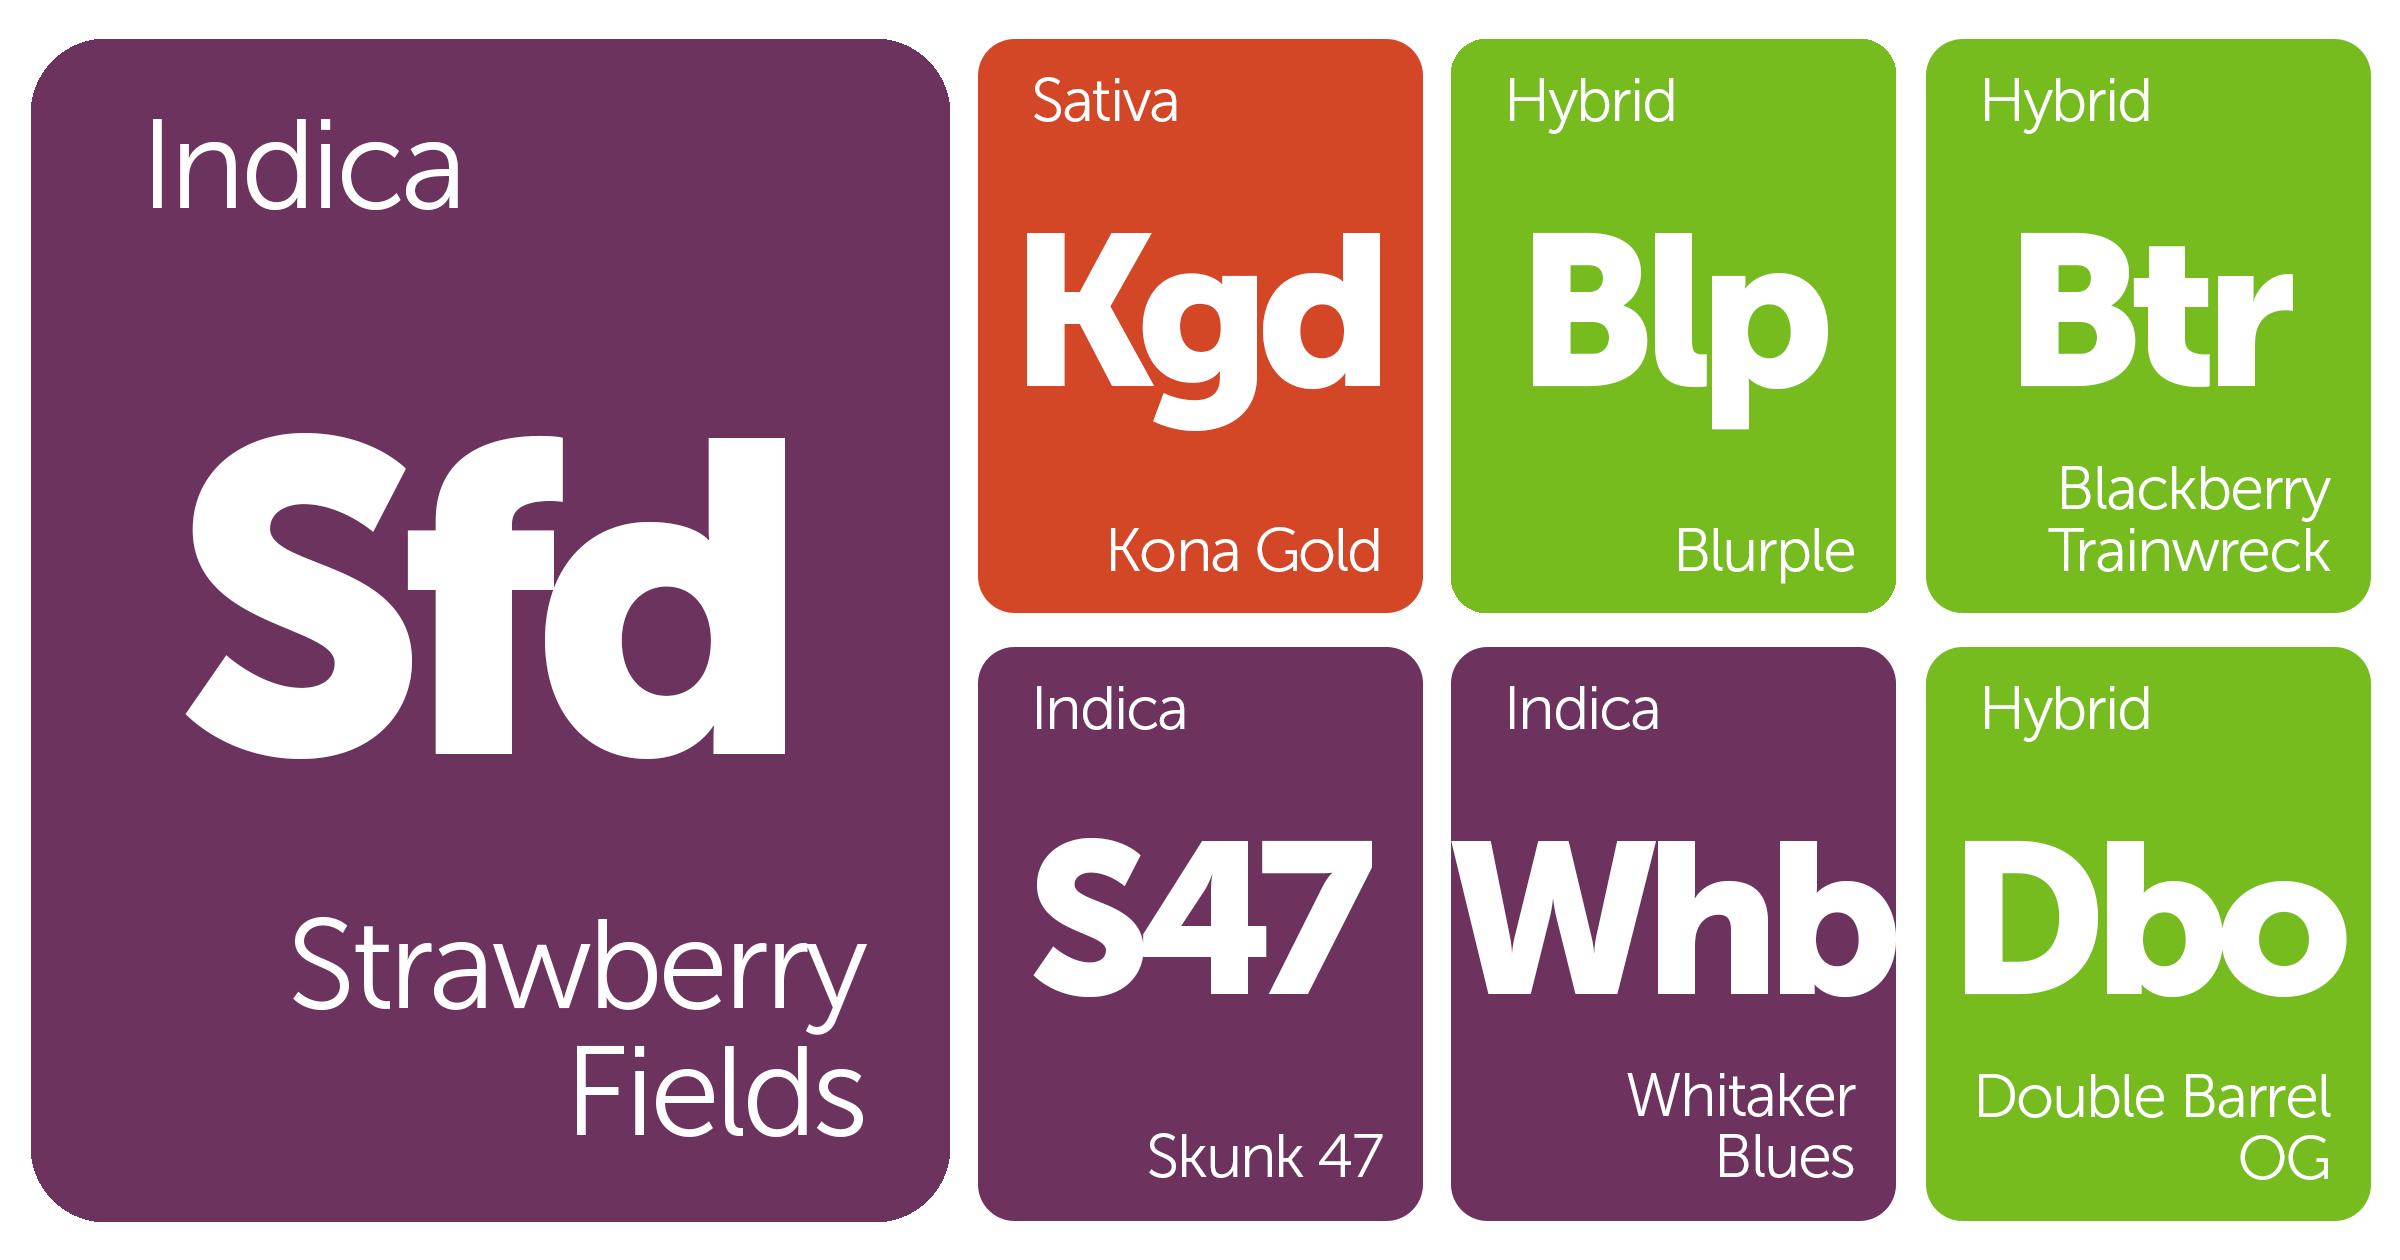 New Strains Alert: Strawberry Fields, Kona Gold, Blurple, Blackberry Trainwreck, and More